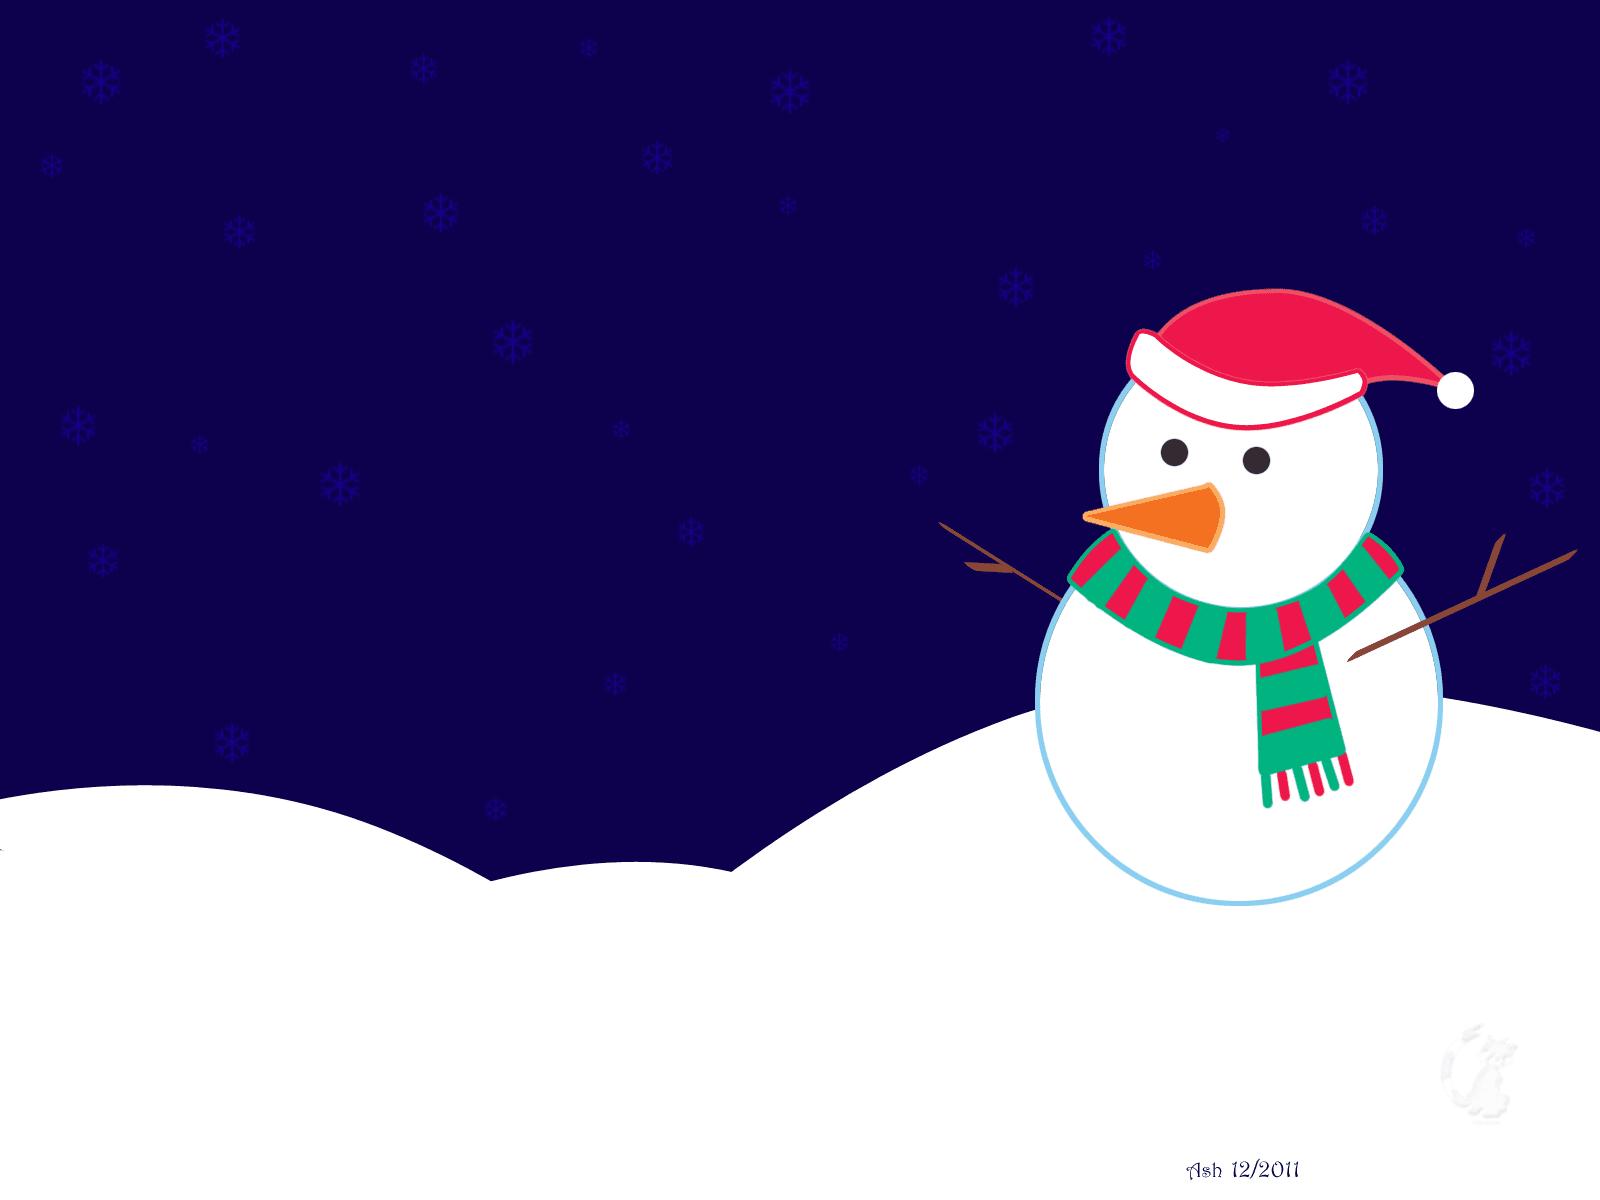 ws Christmas Snowman 1600x1200 5a28253b13f1290038dc5f11